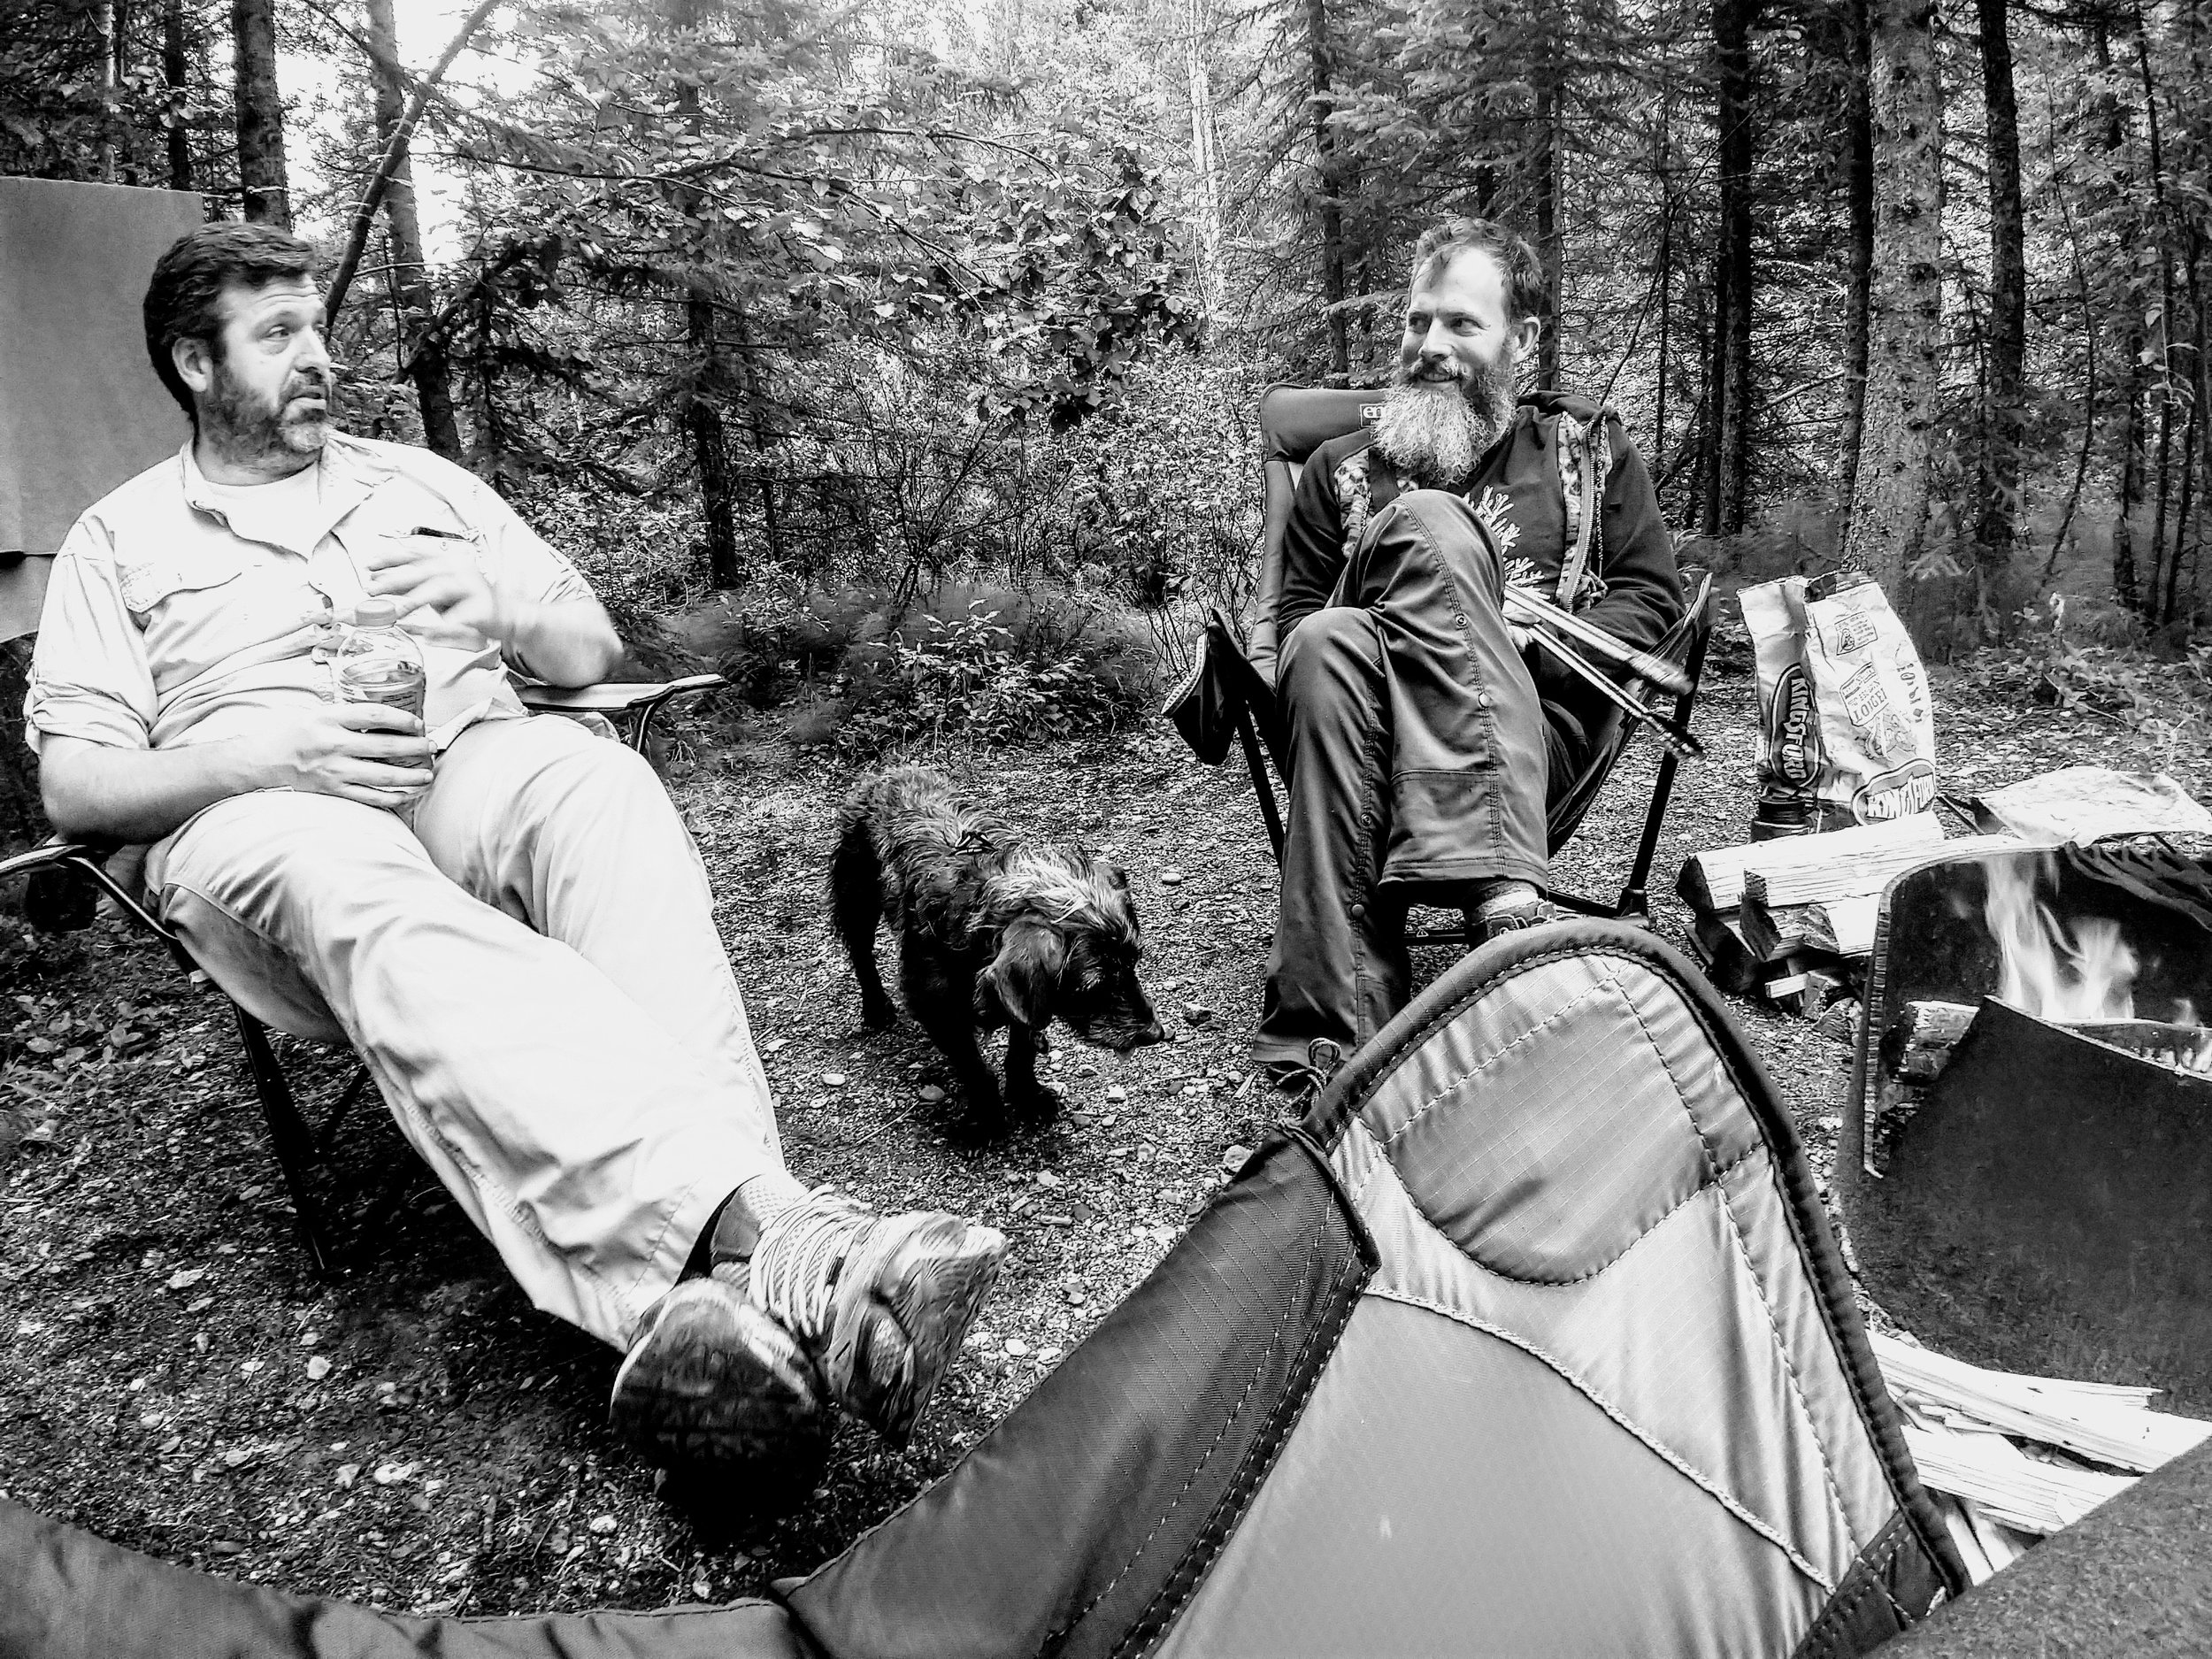 Our pal Shooter, Pelé, and a giant man-cricket - Fairbanks, AK